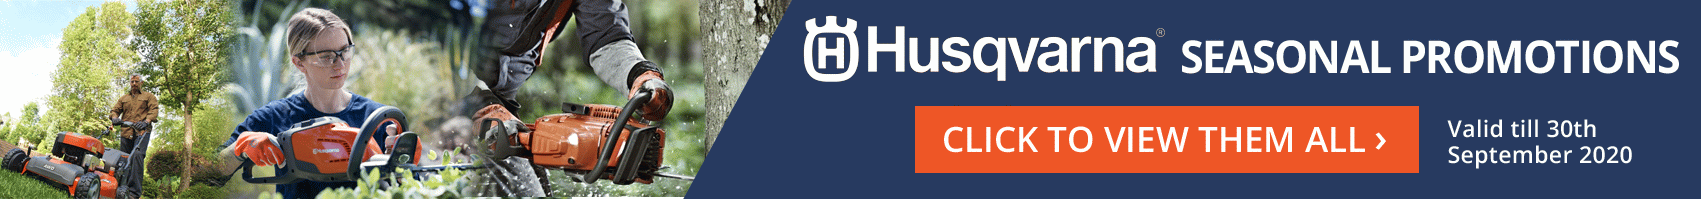 Husqvarna Seasonal Promotions